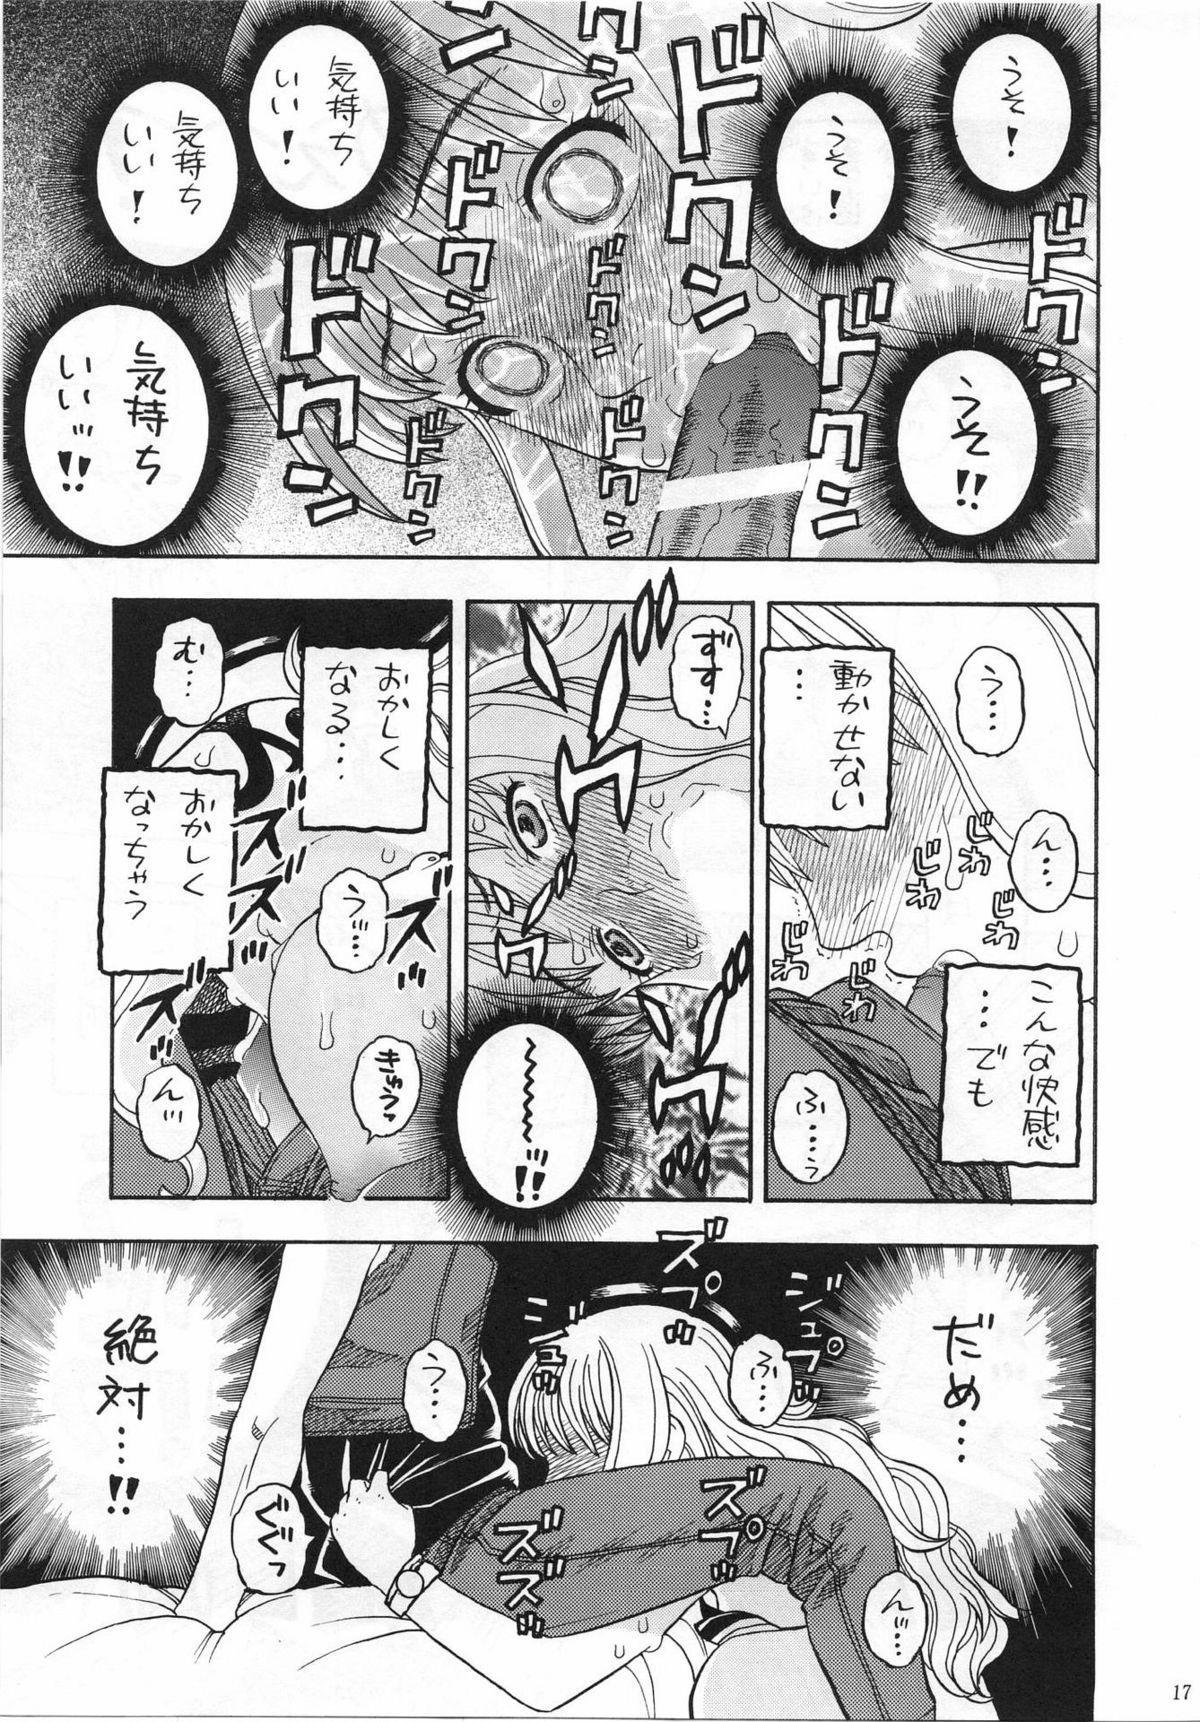 Nami no Iinari Saimin 13